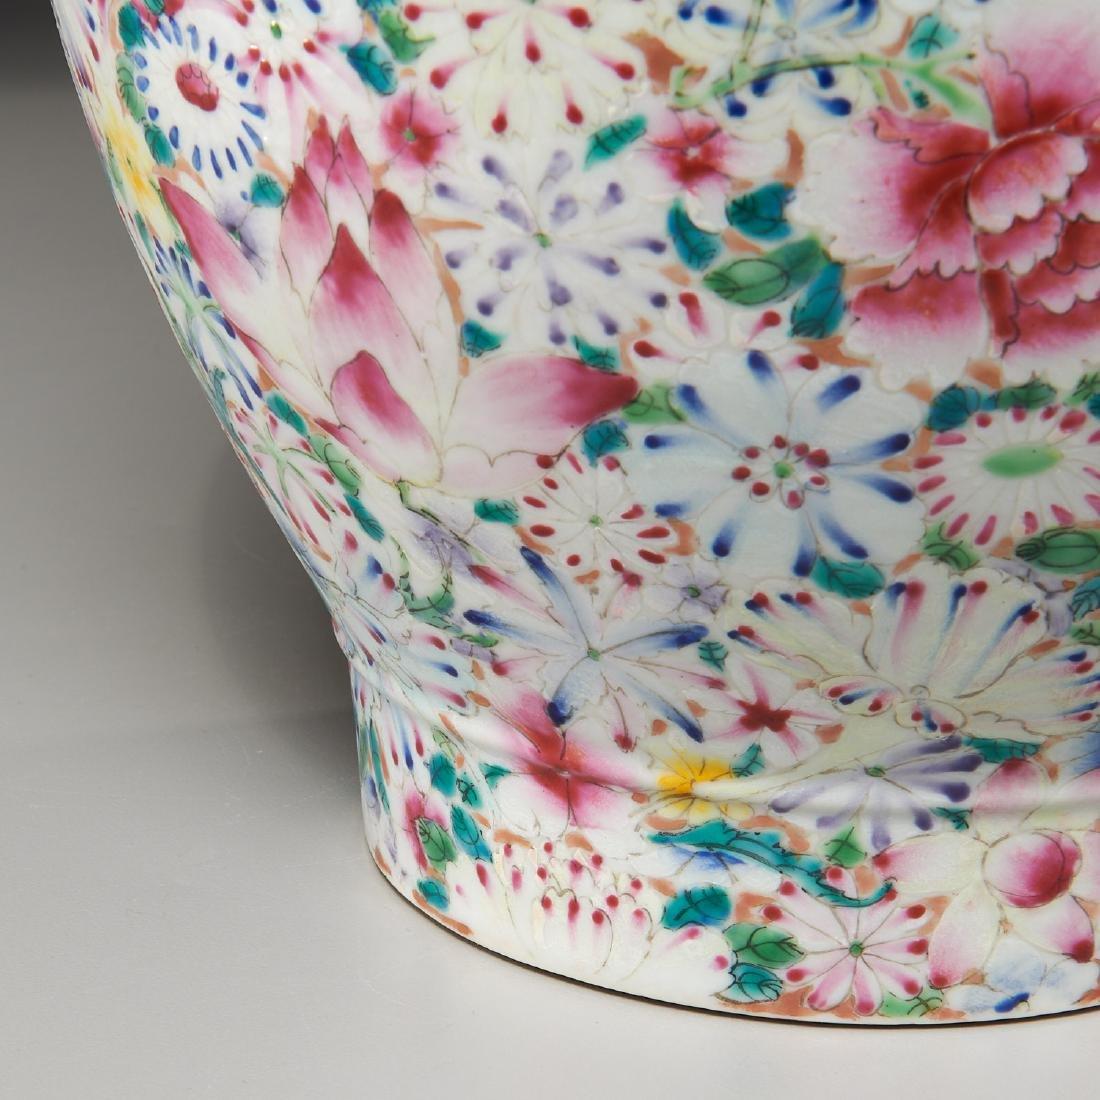 Chinese porcelain millefleurs vase - 3